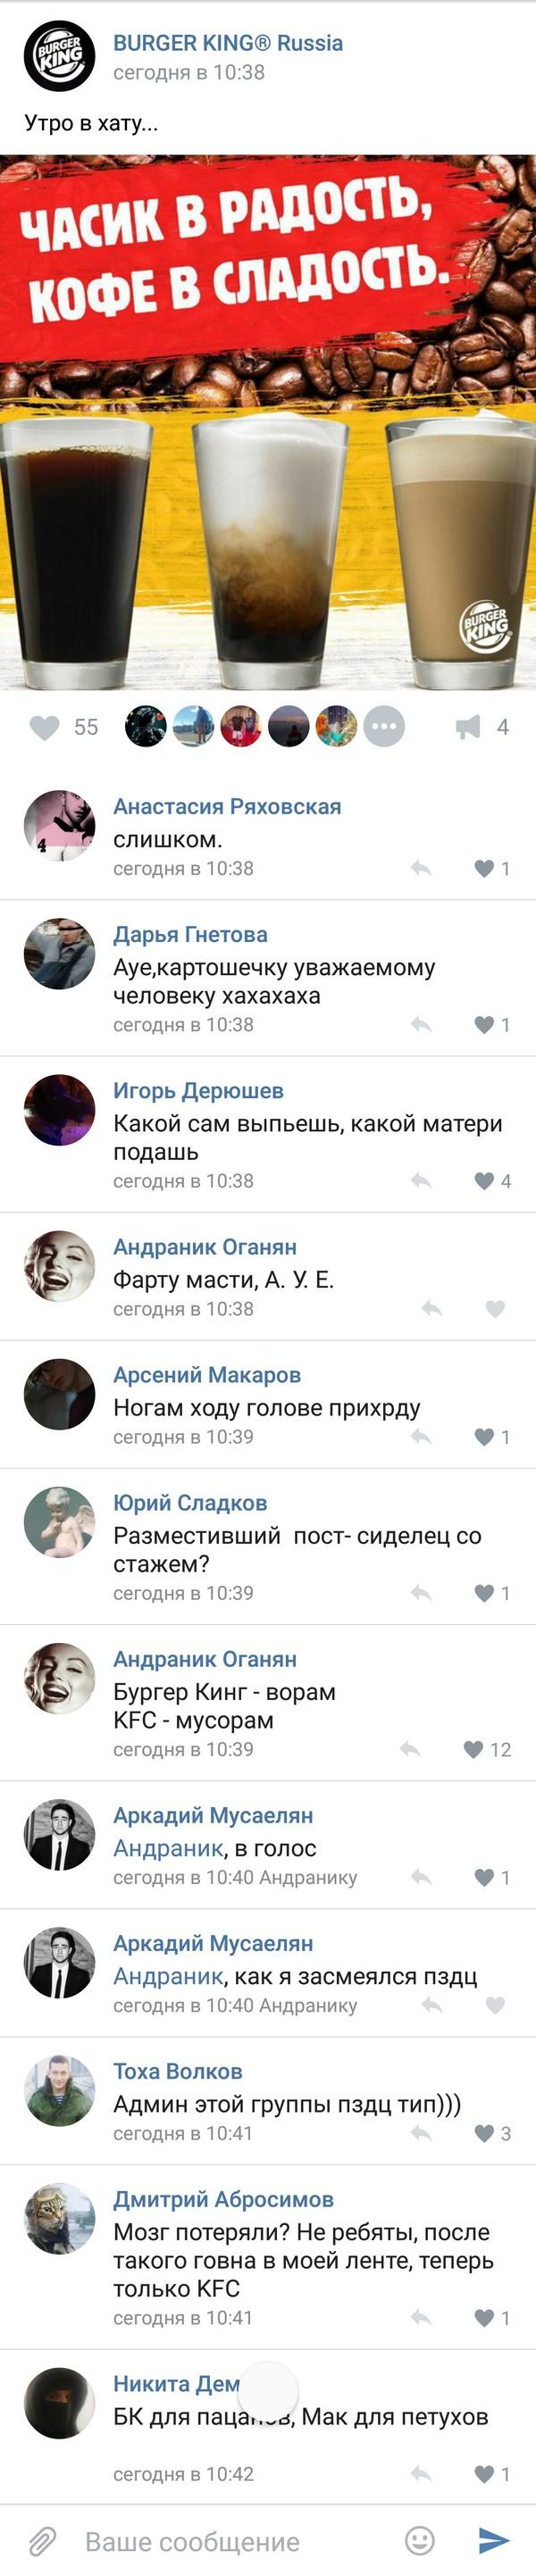 Бургер Кинг в законе) Бургер кинг, Вечер, Вор, Длиннопост